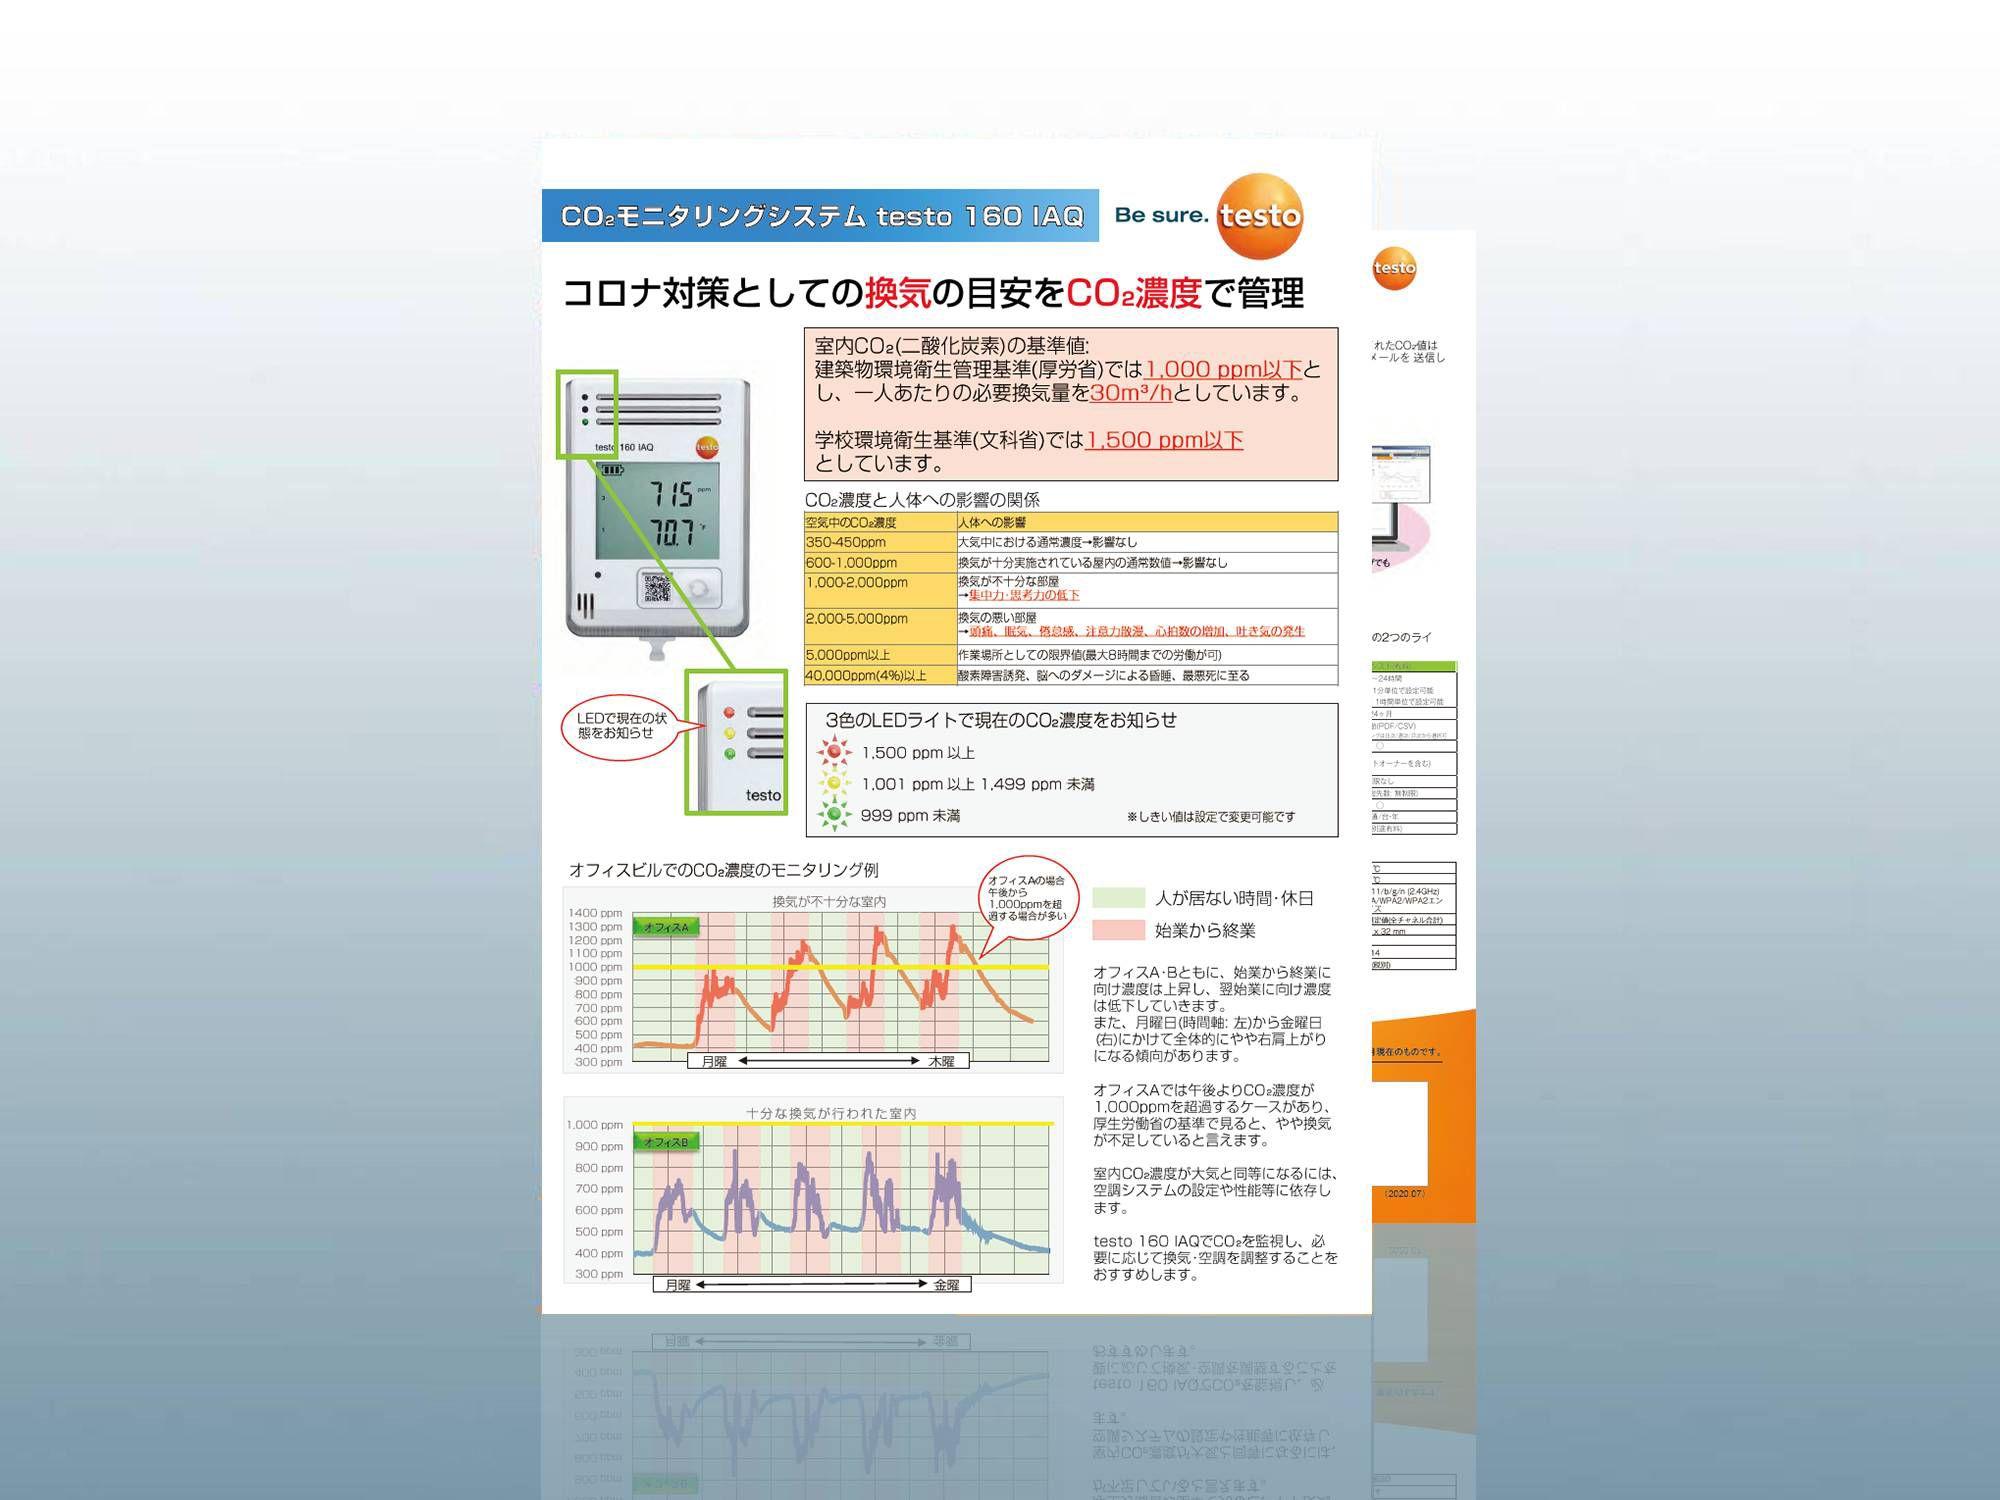 jp_testo-160-iaq_co2_thumbnail_im.png